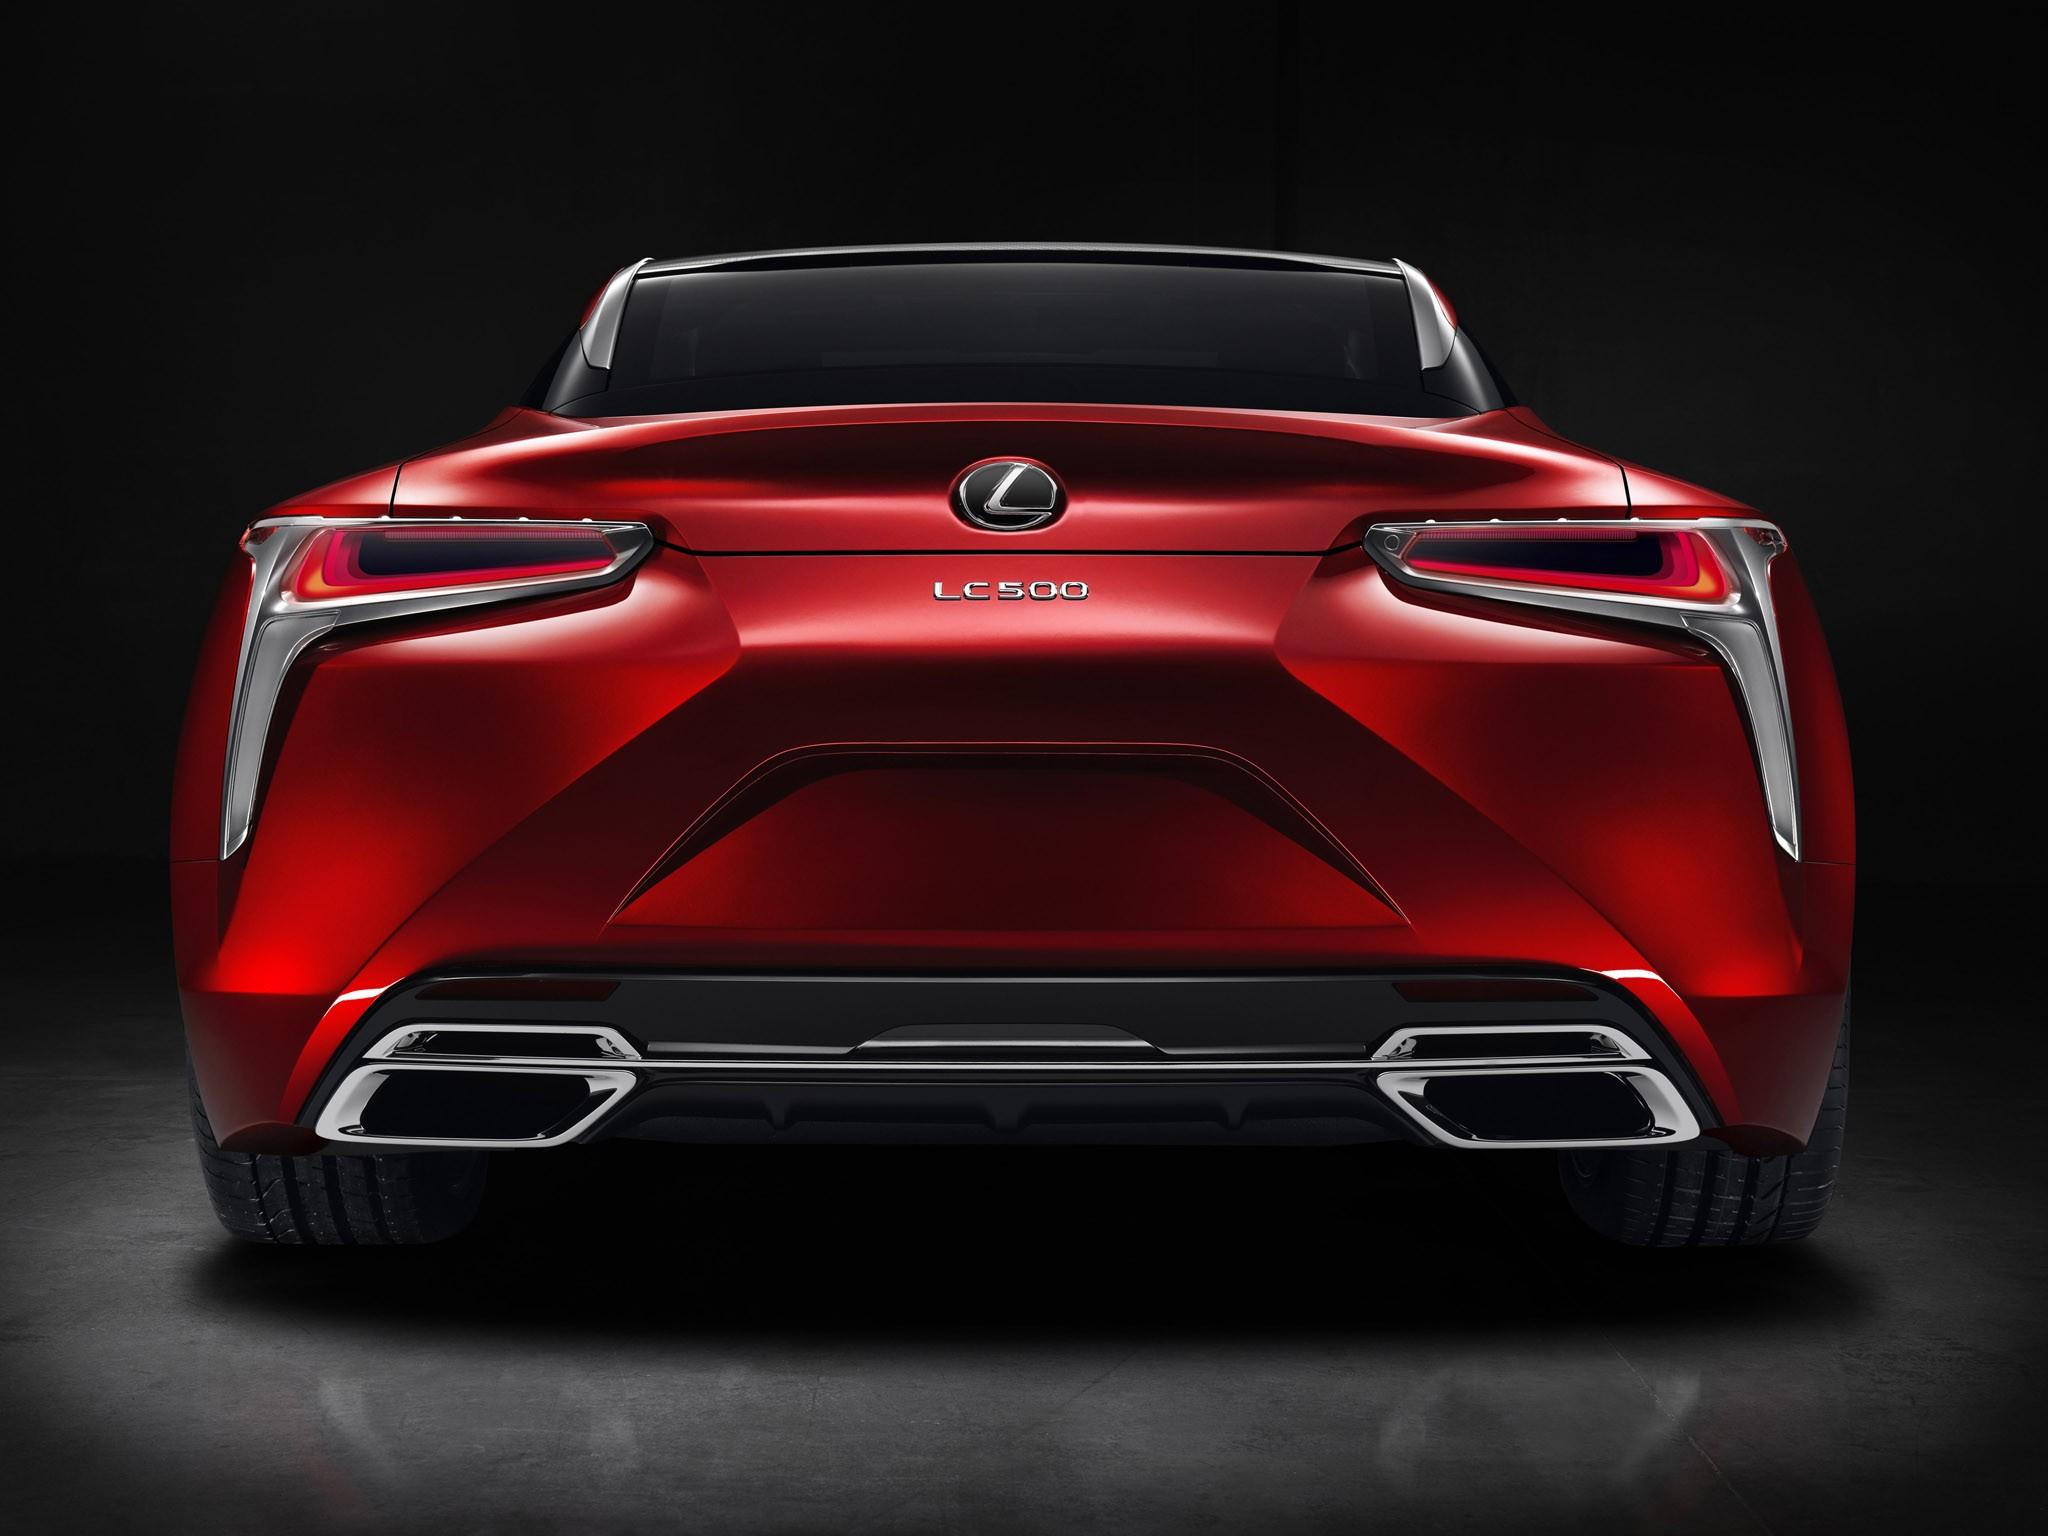 2016 Lexus LC 500